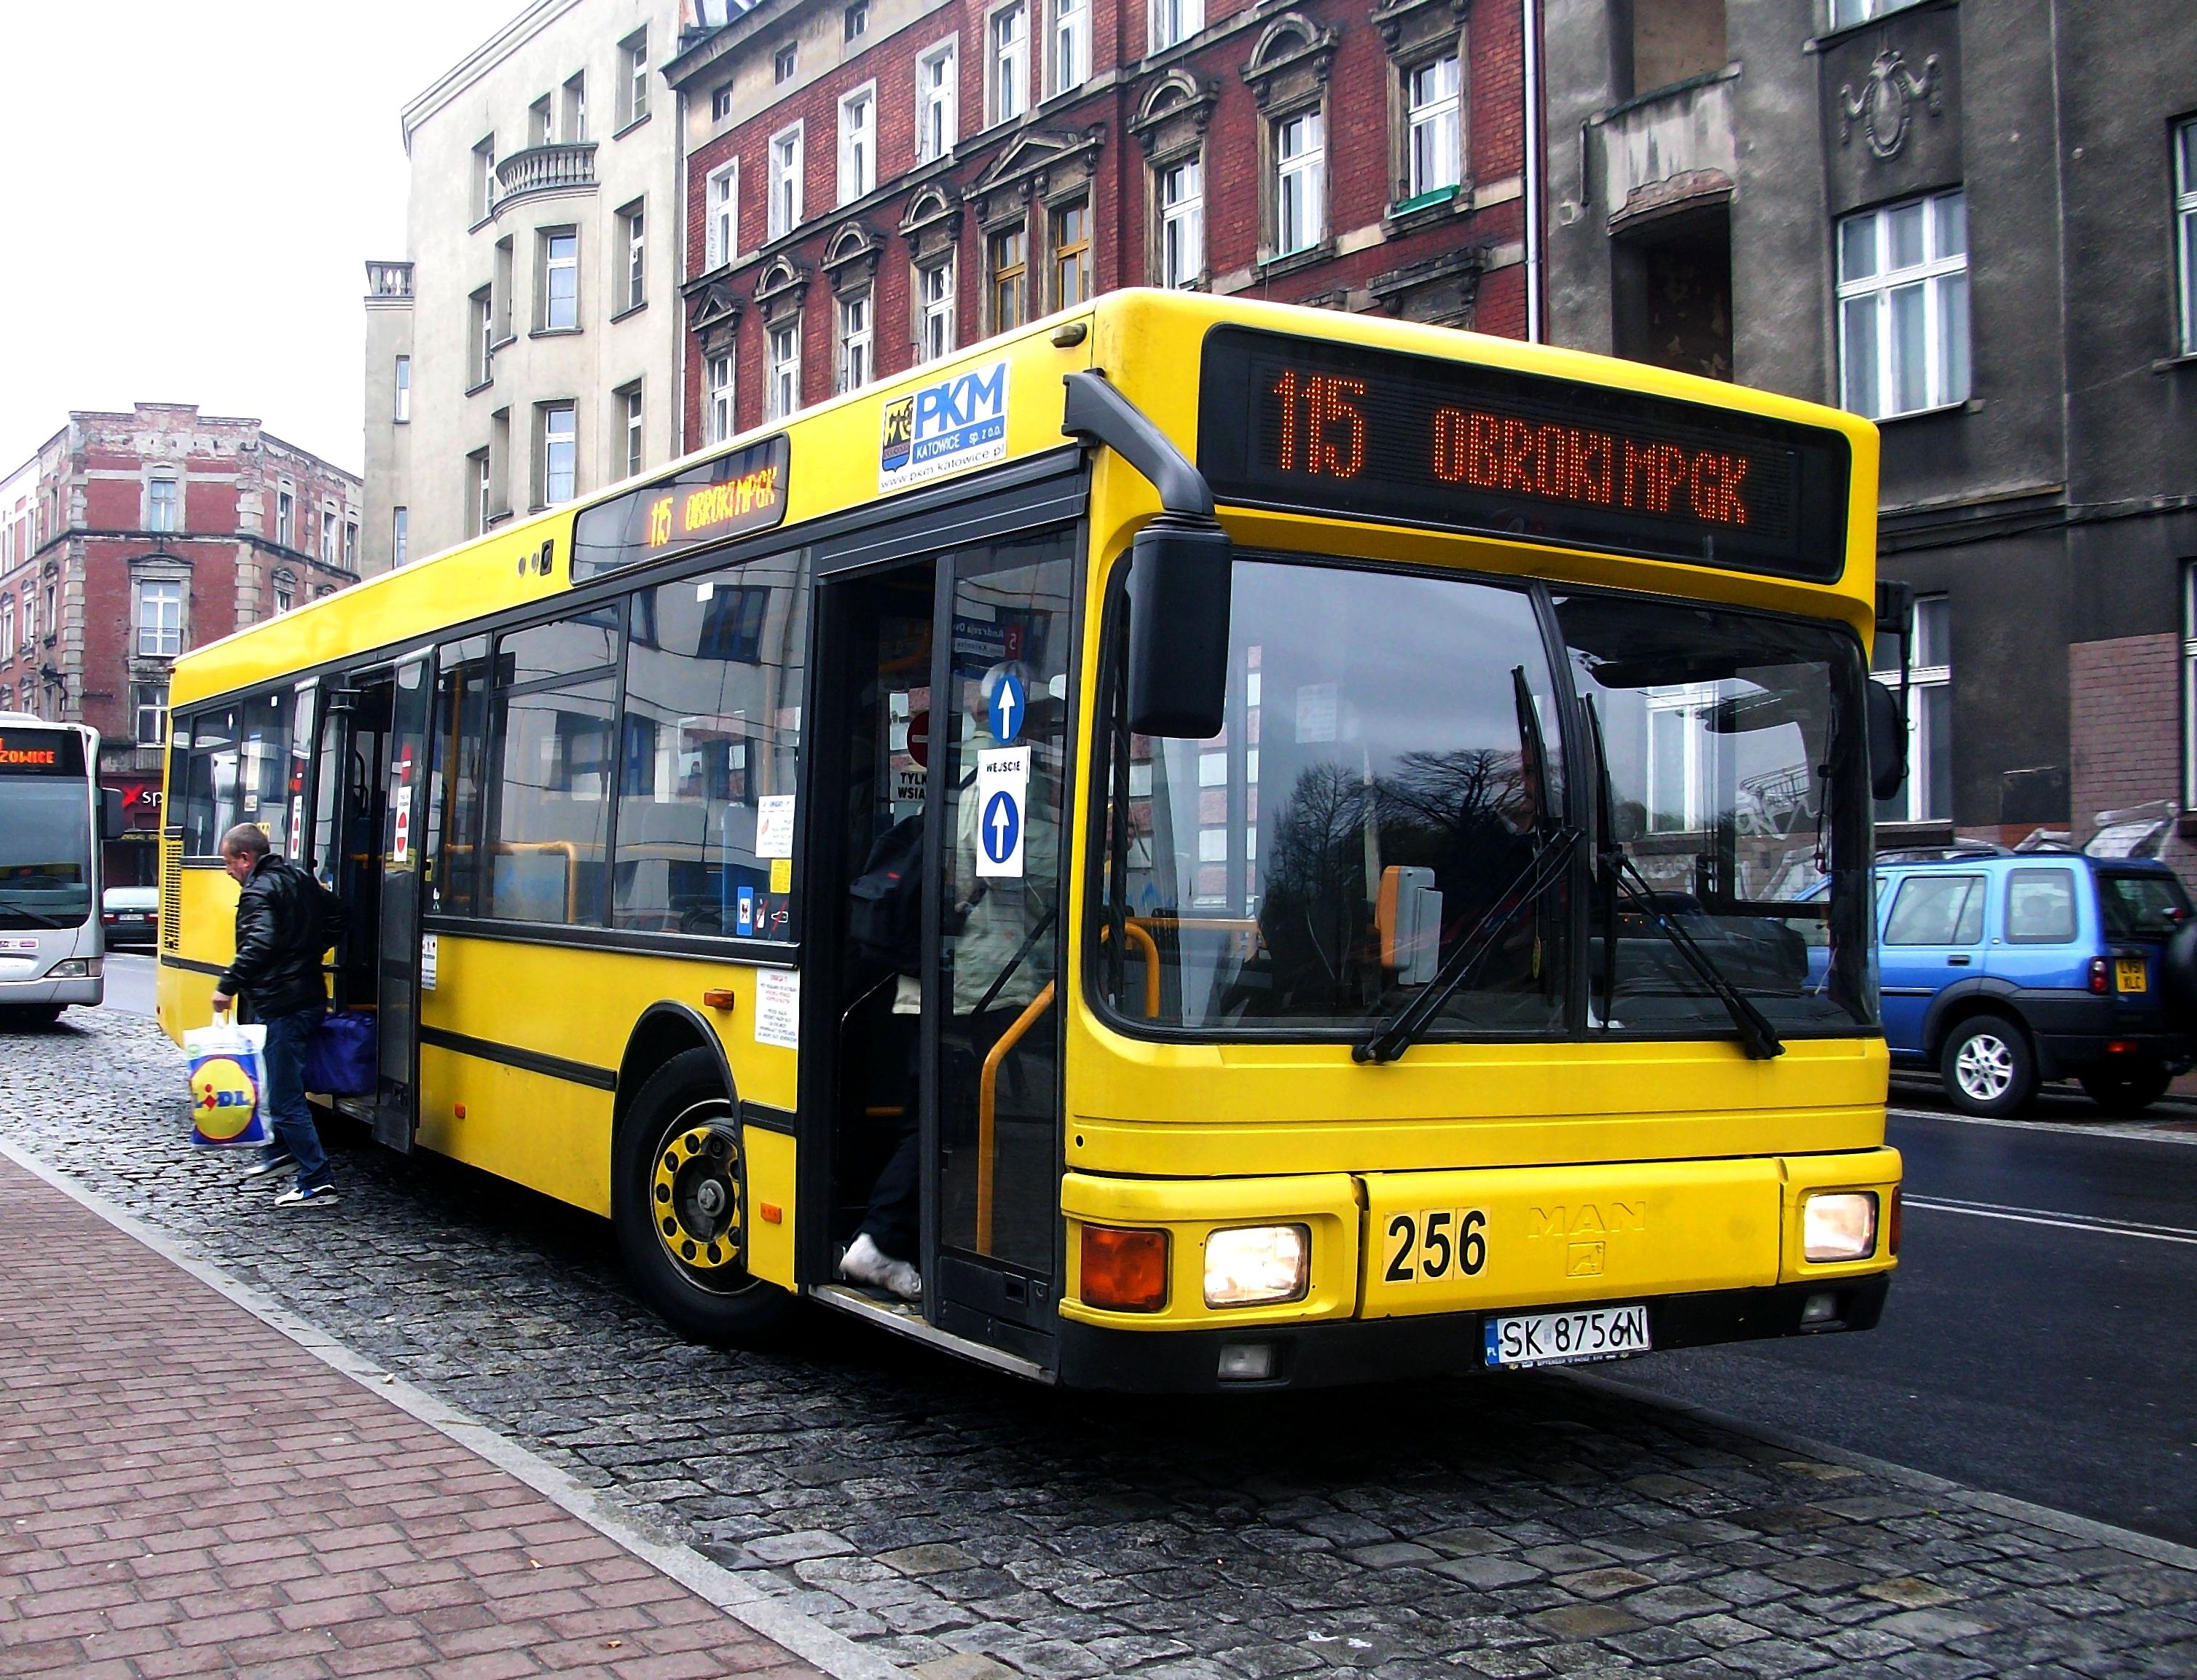 File:Katowice MAN bus n°256.JPG - Wikimedia Commons